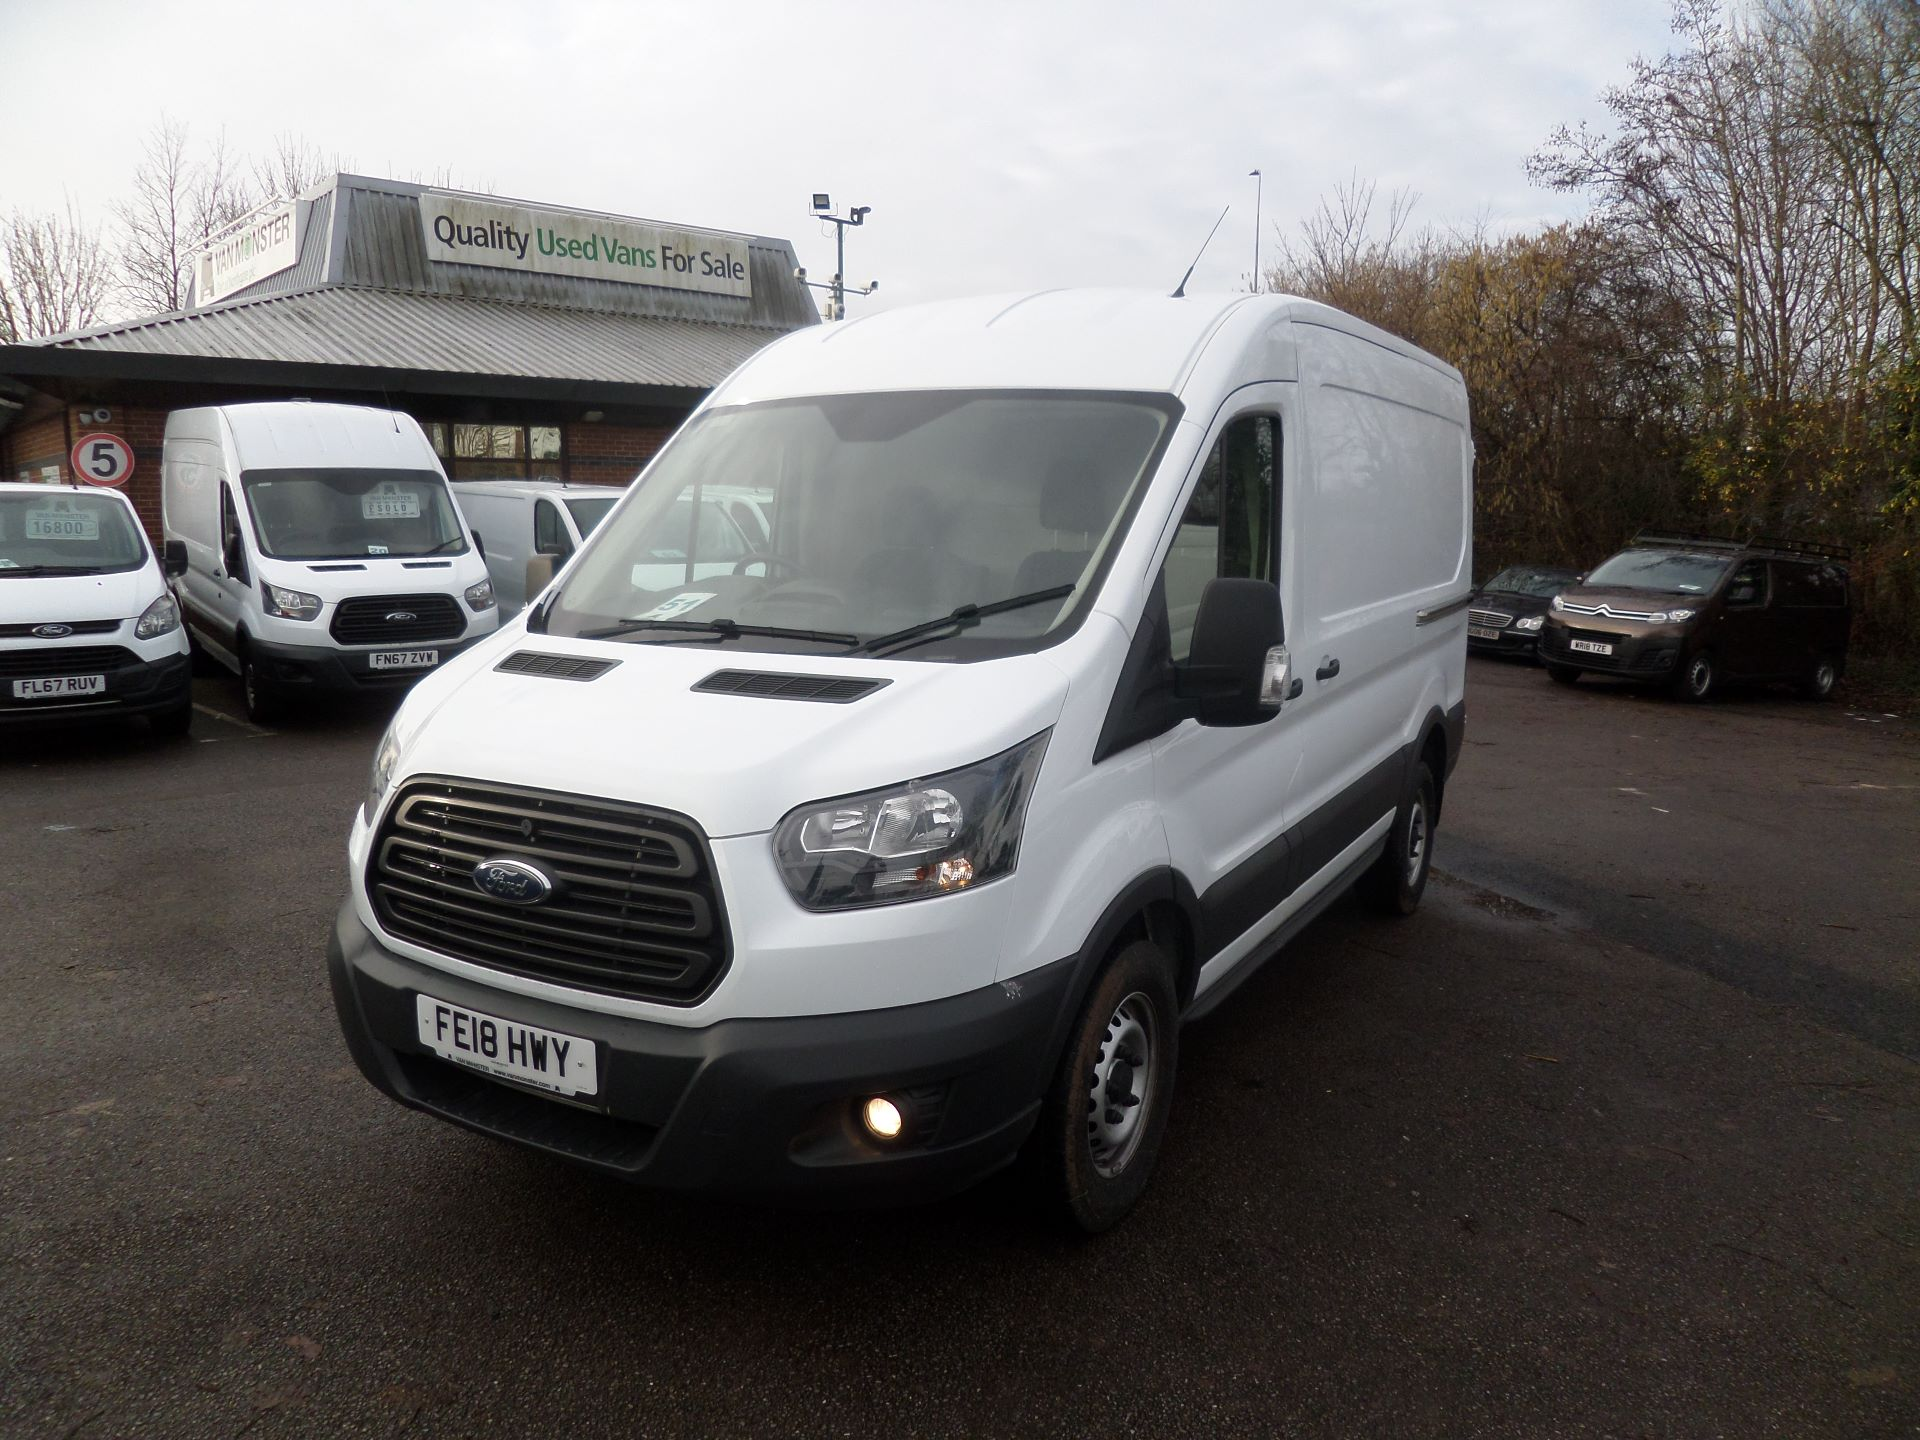 2018 Ford Transit 2.0 Tdci 130Ps MWB/ H2 Van Euro 6 (FE18HWY) Image 9